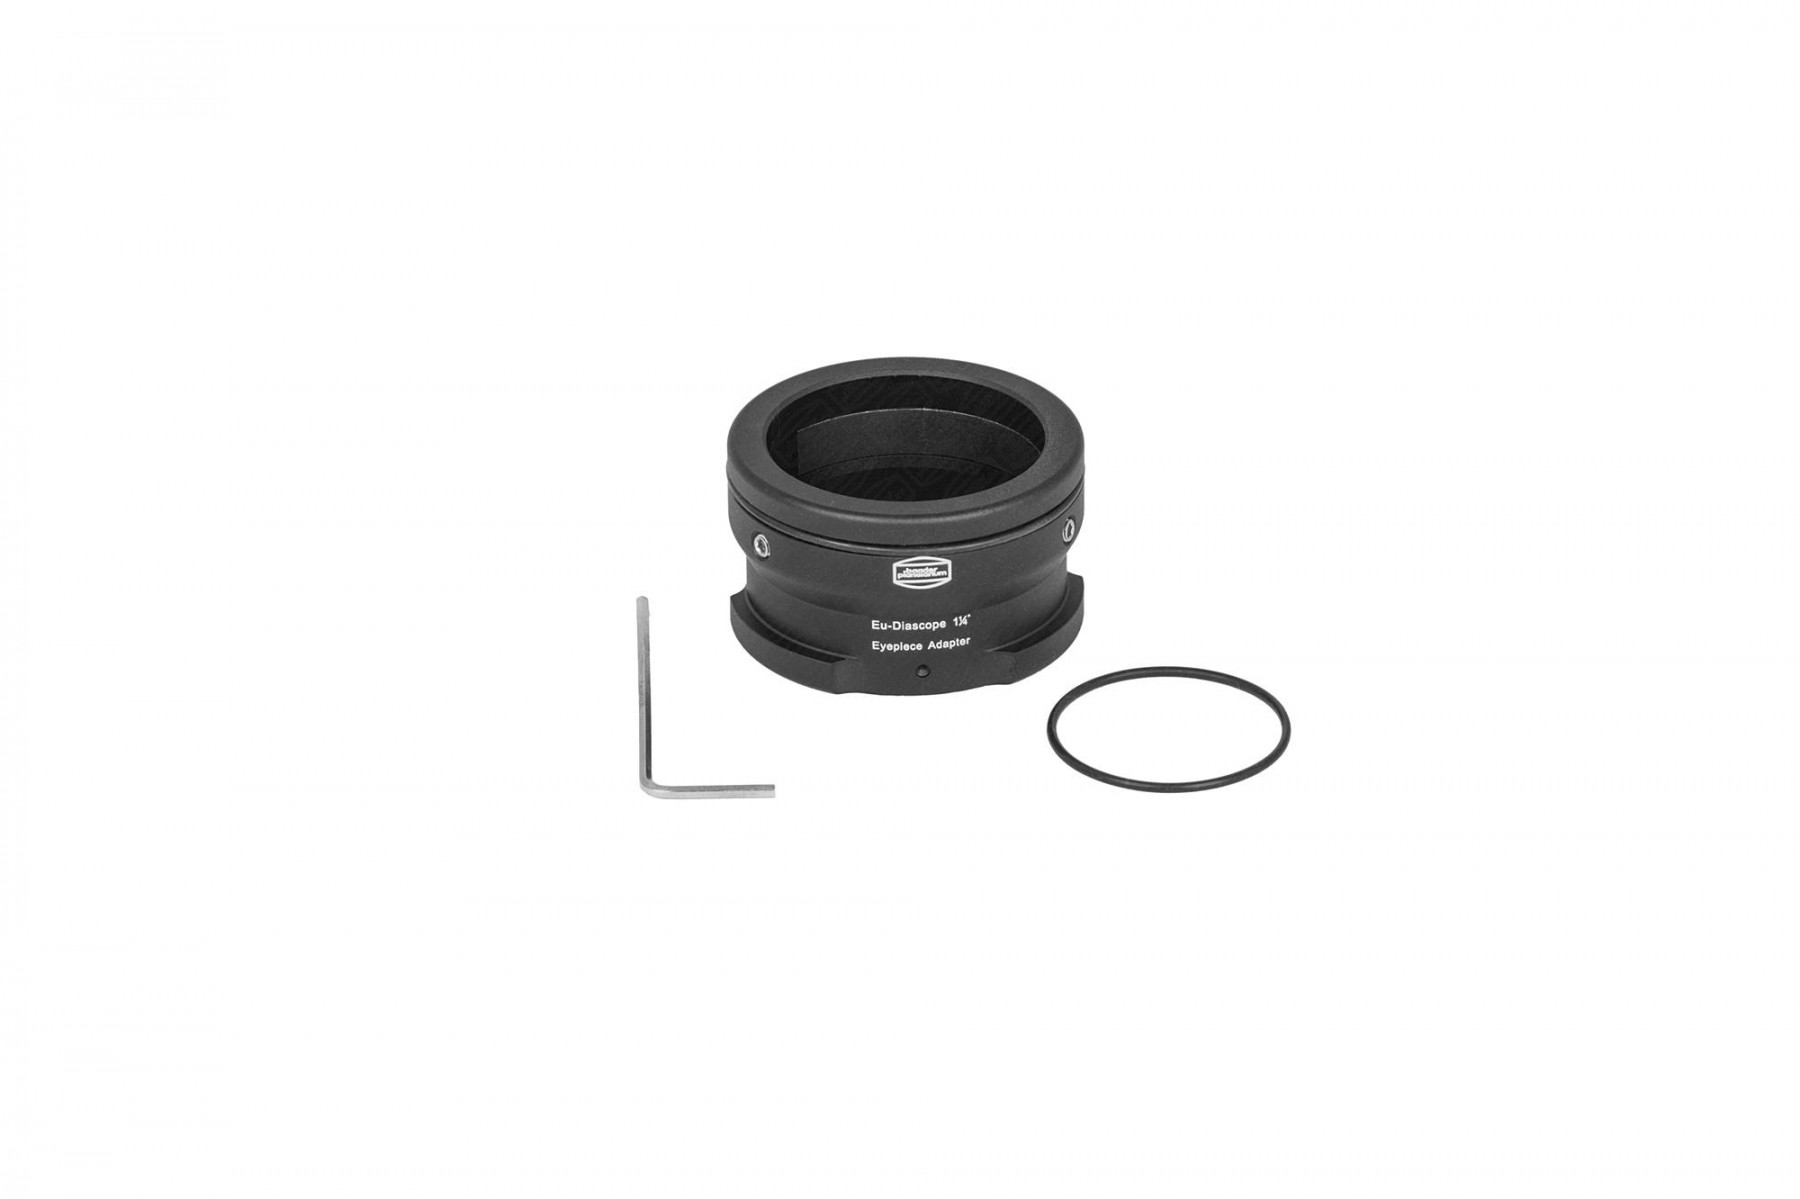 Lieferumfang: Classic Ortho 6mm (nicht abgebildet) Zeiss Diascope Okularbajonett, Inbusschlüssel, 2x O-Ringe (1x montiert)